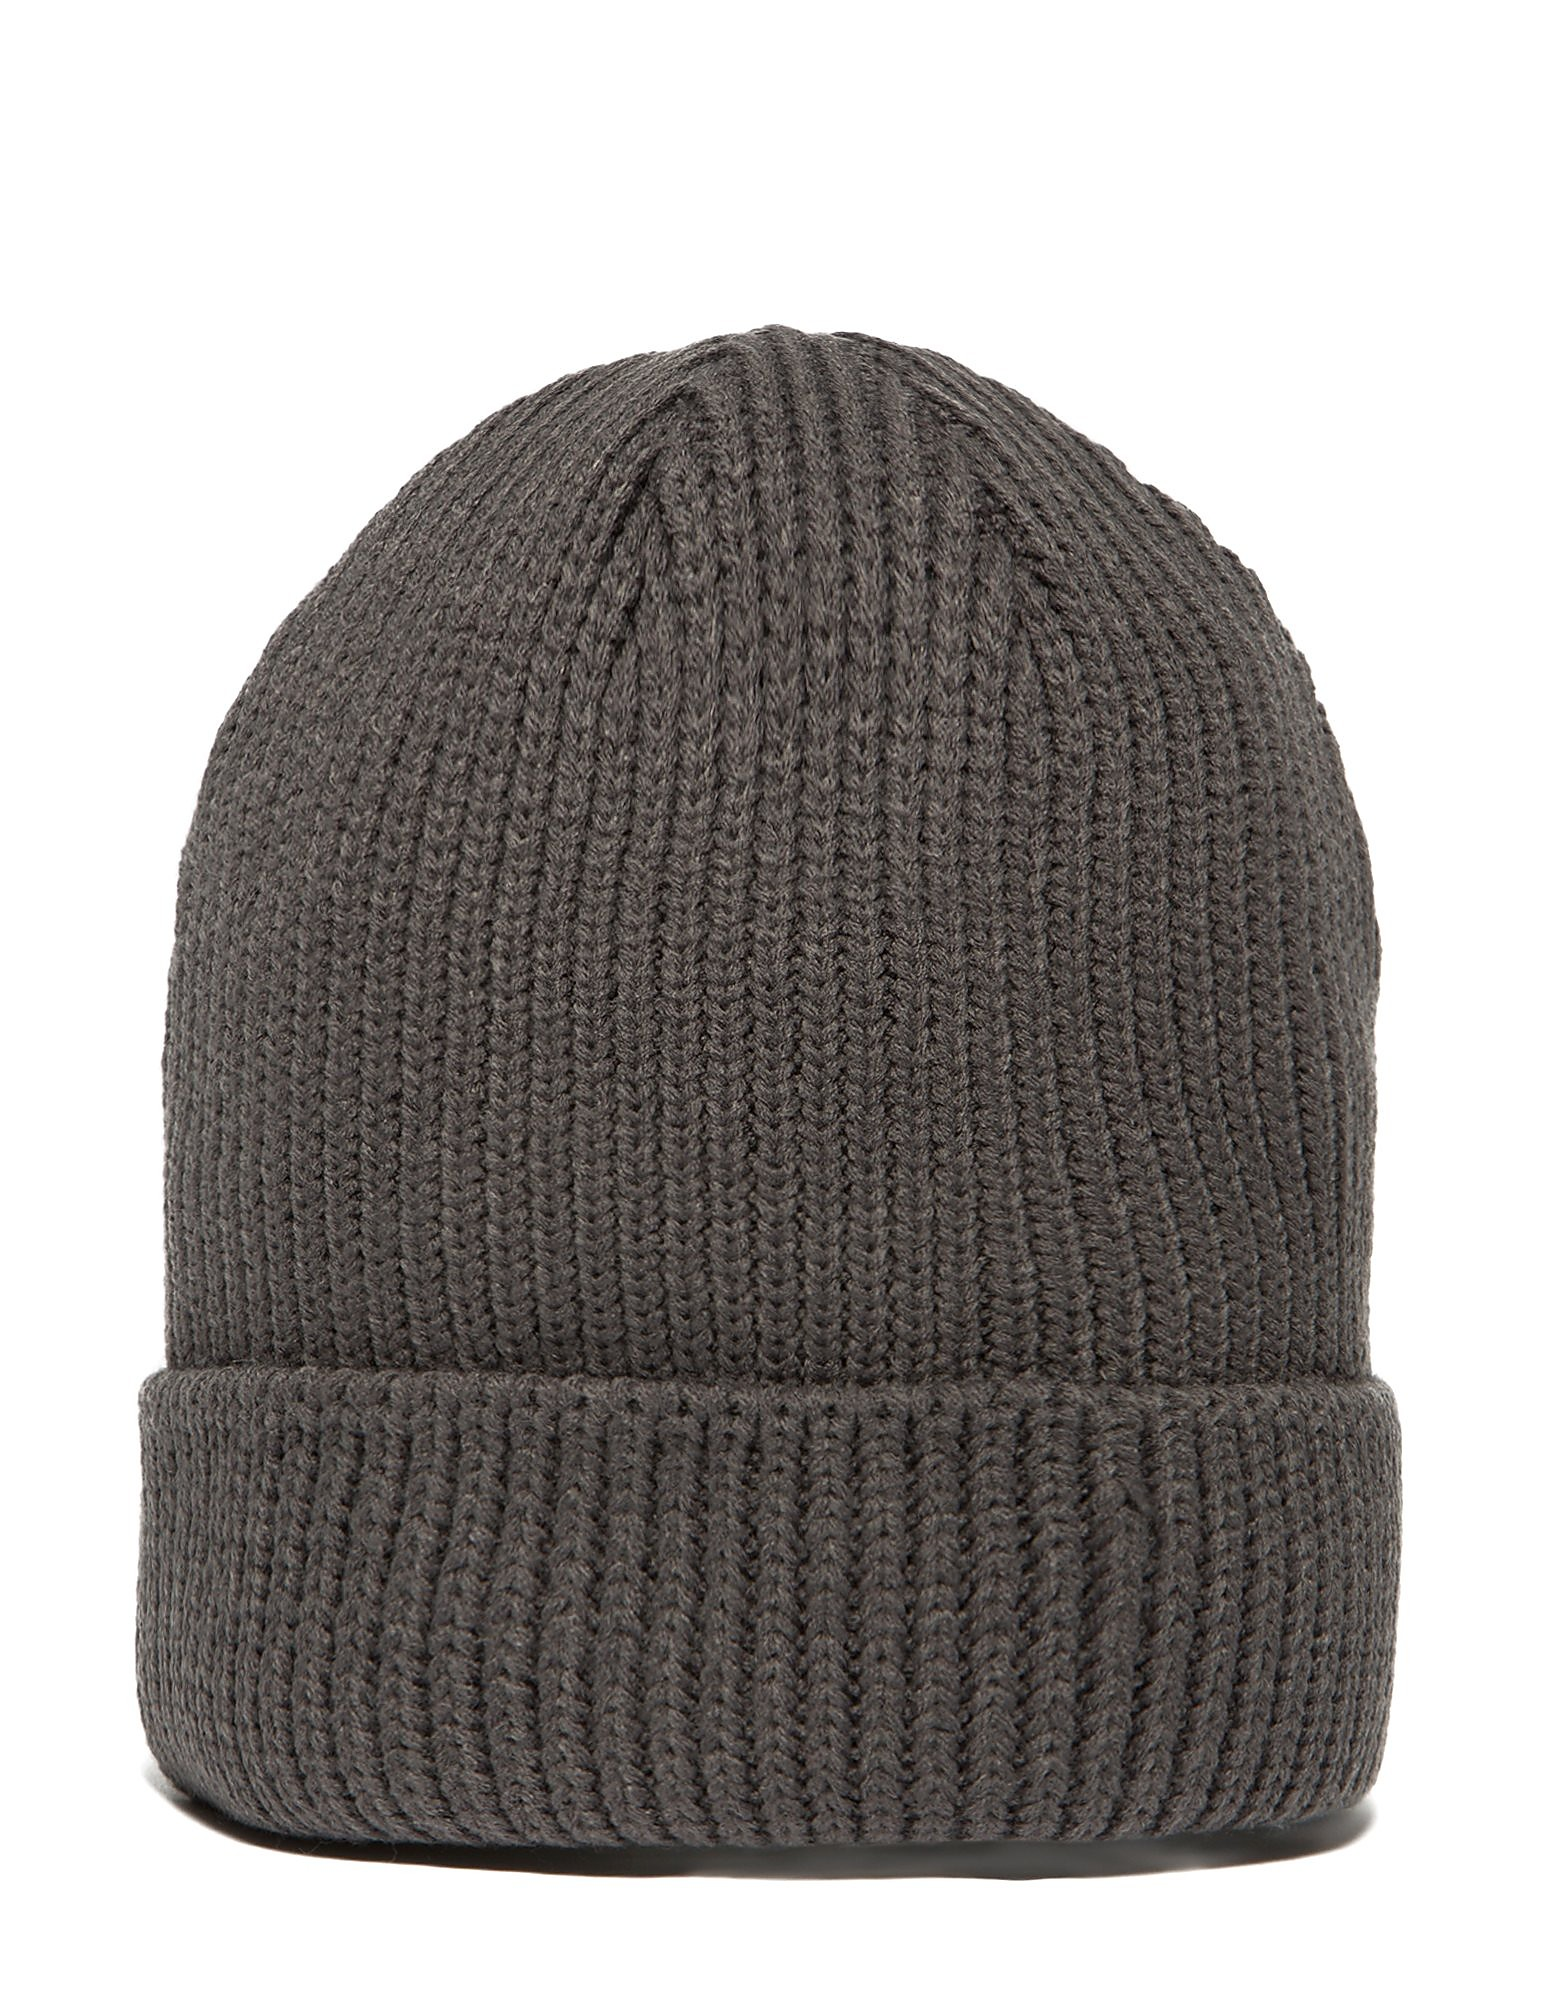 Duffer of St George Anchor 3 Beanie Hat